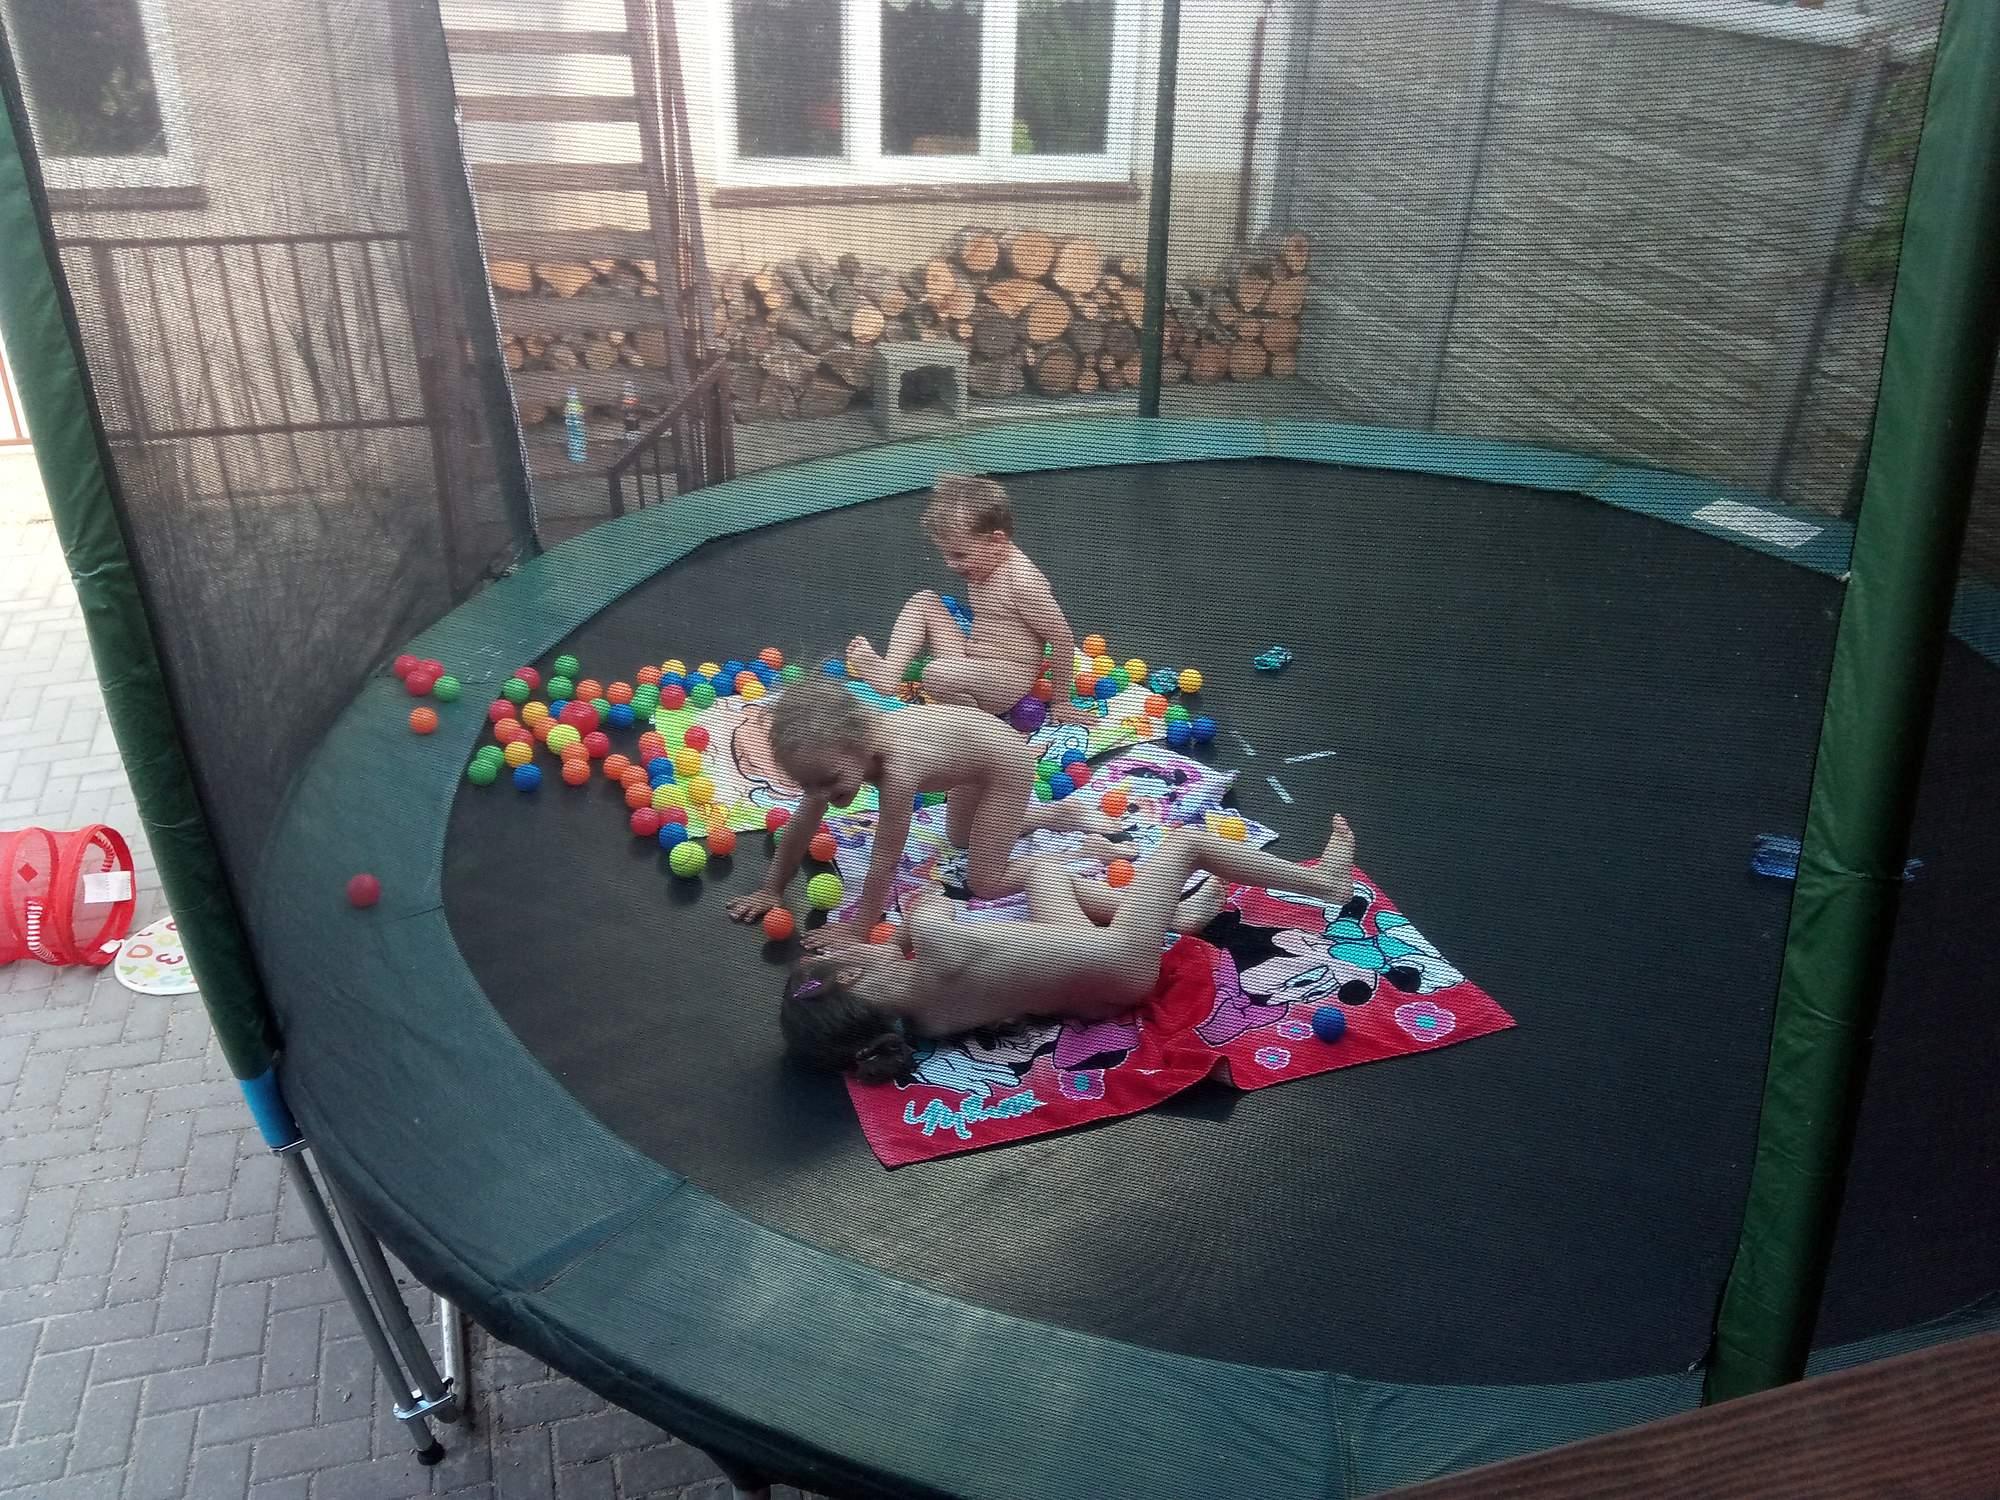 rajce idnes cz boys Idnes.cz Rajce boys pool